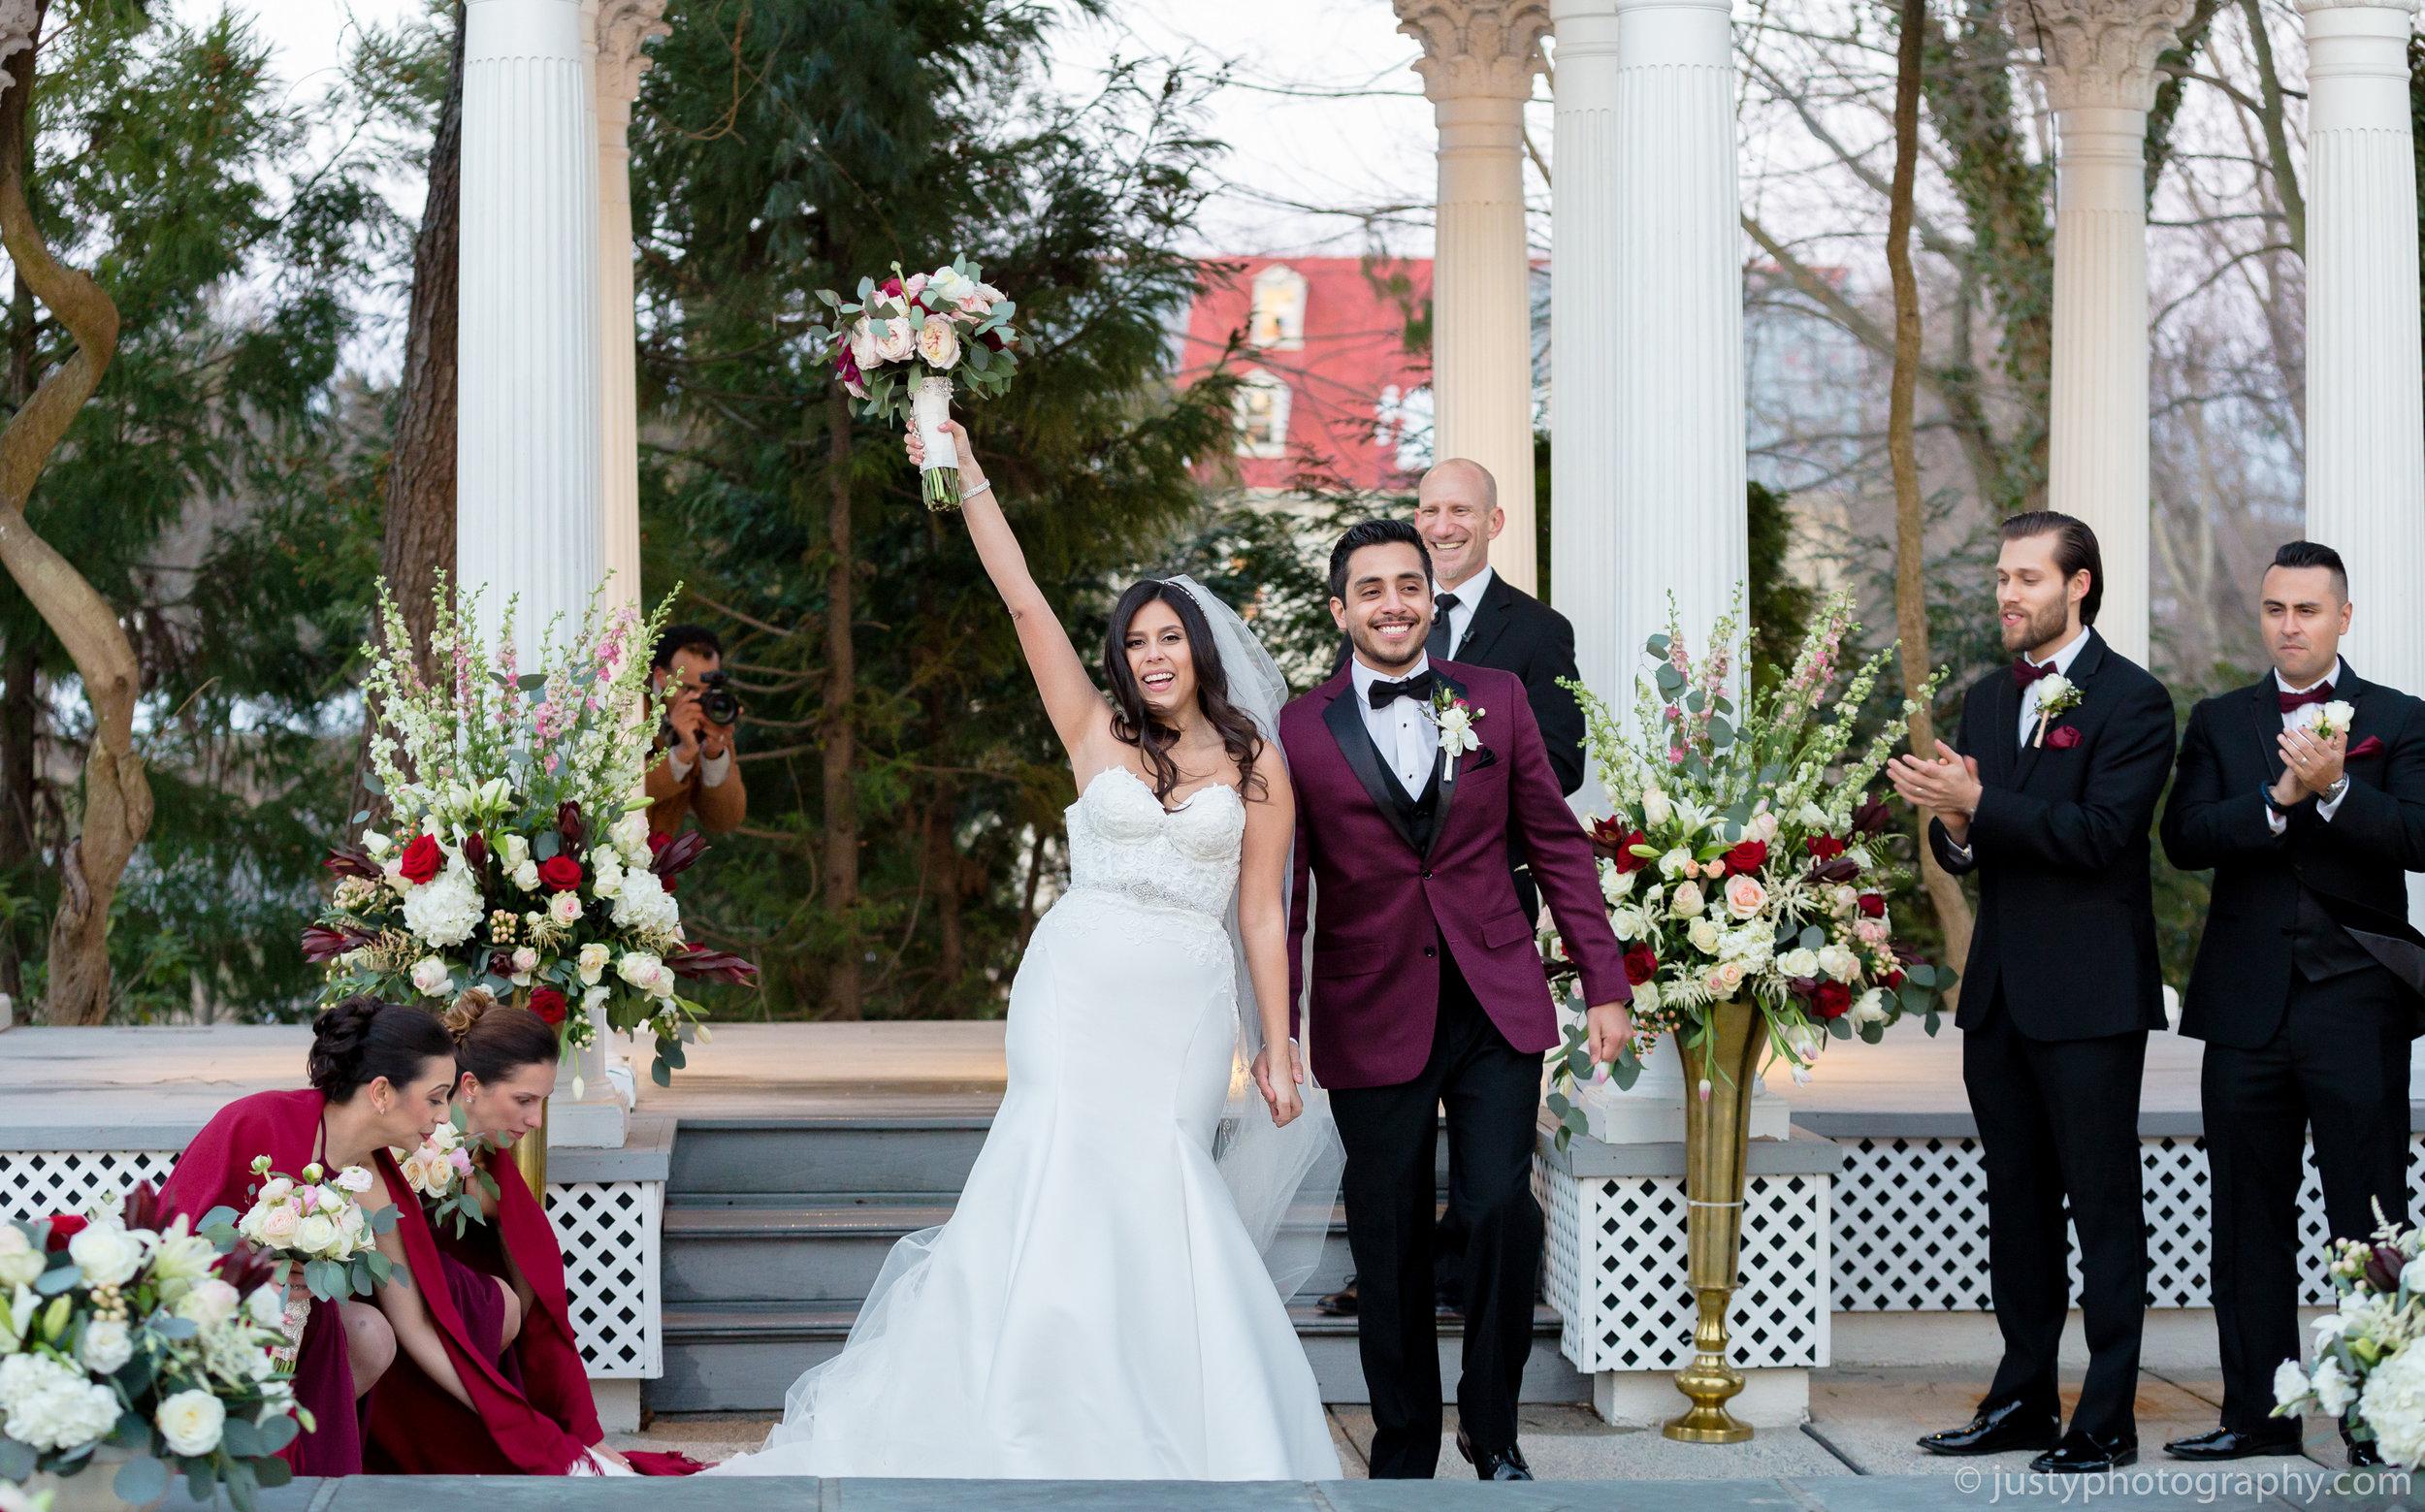 Ceresville Mansion Wedding Photos-Wedding Ceremony Exit.jpg